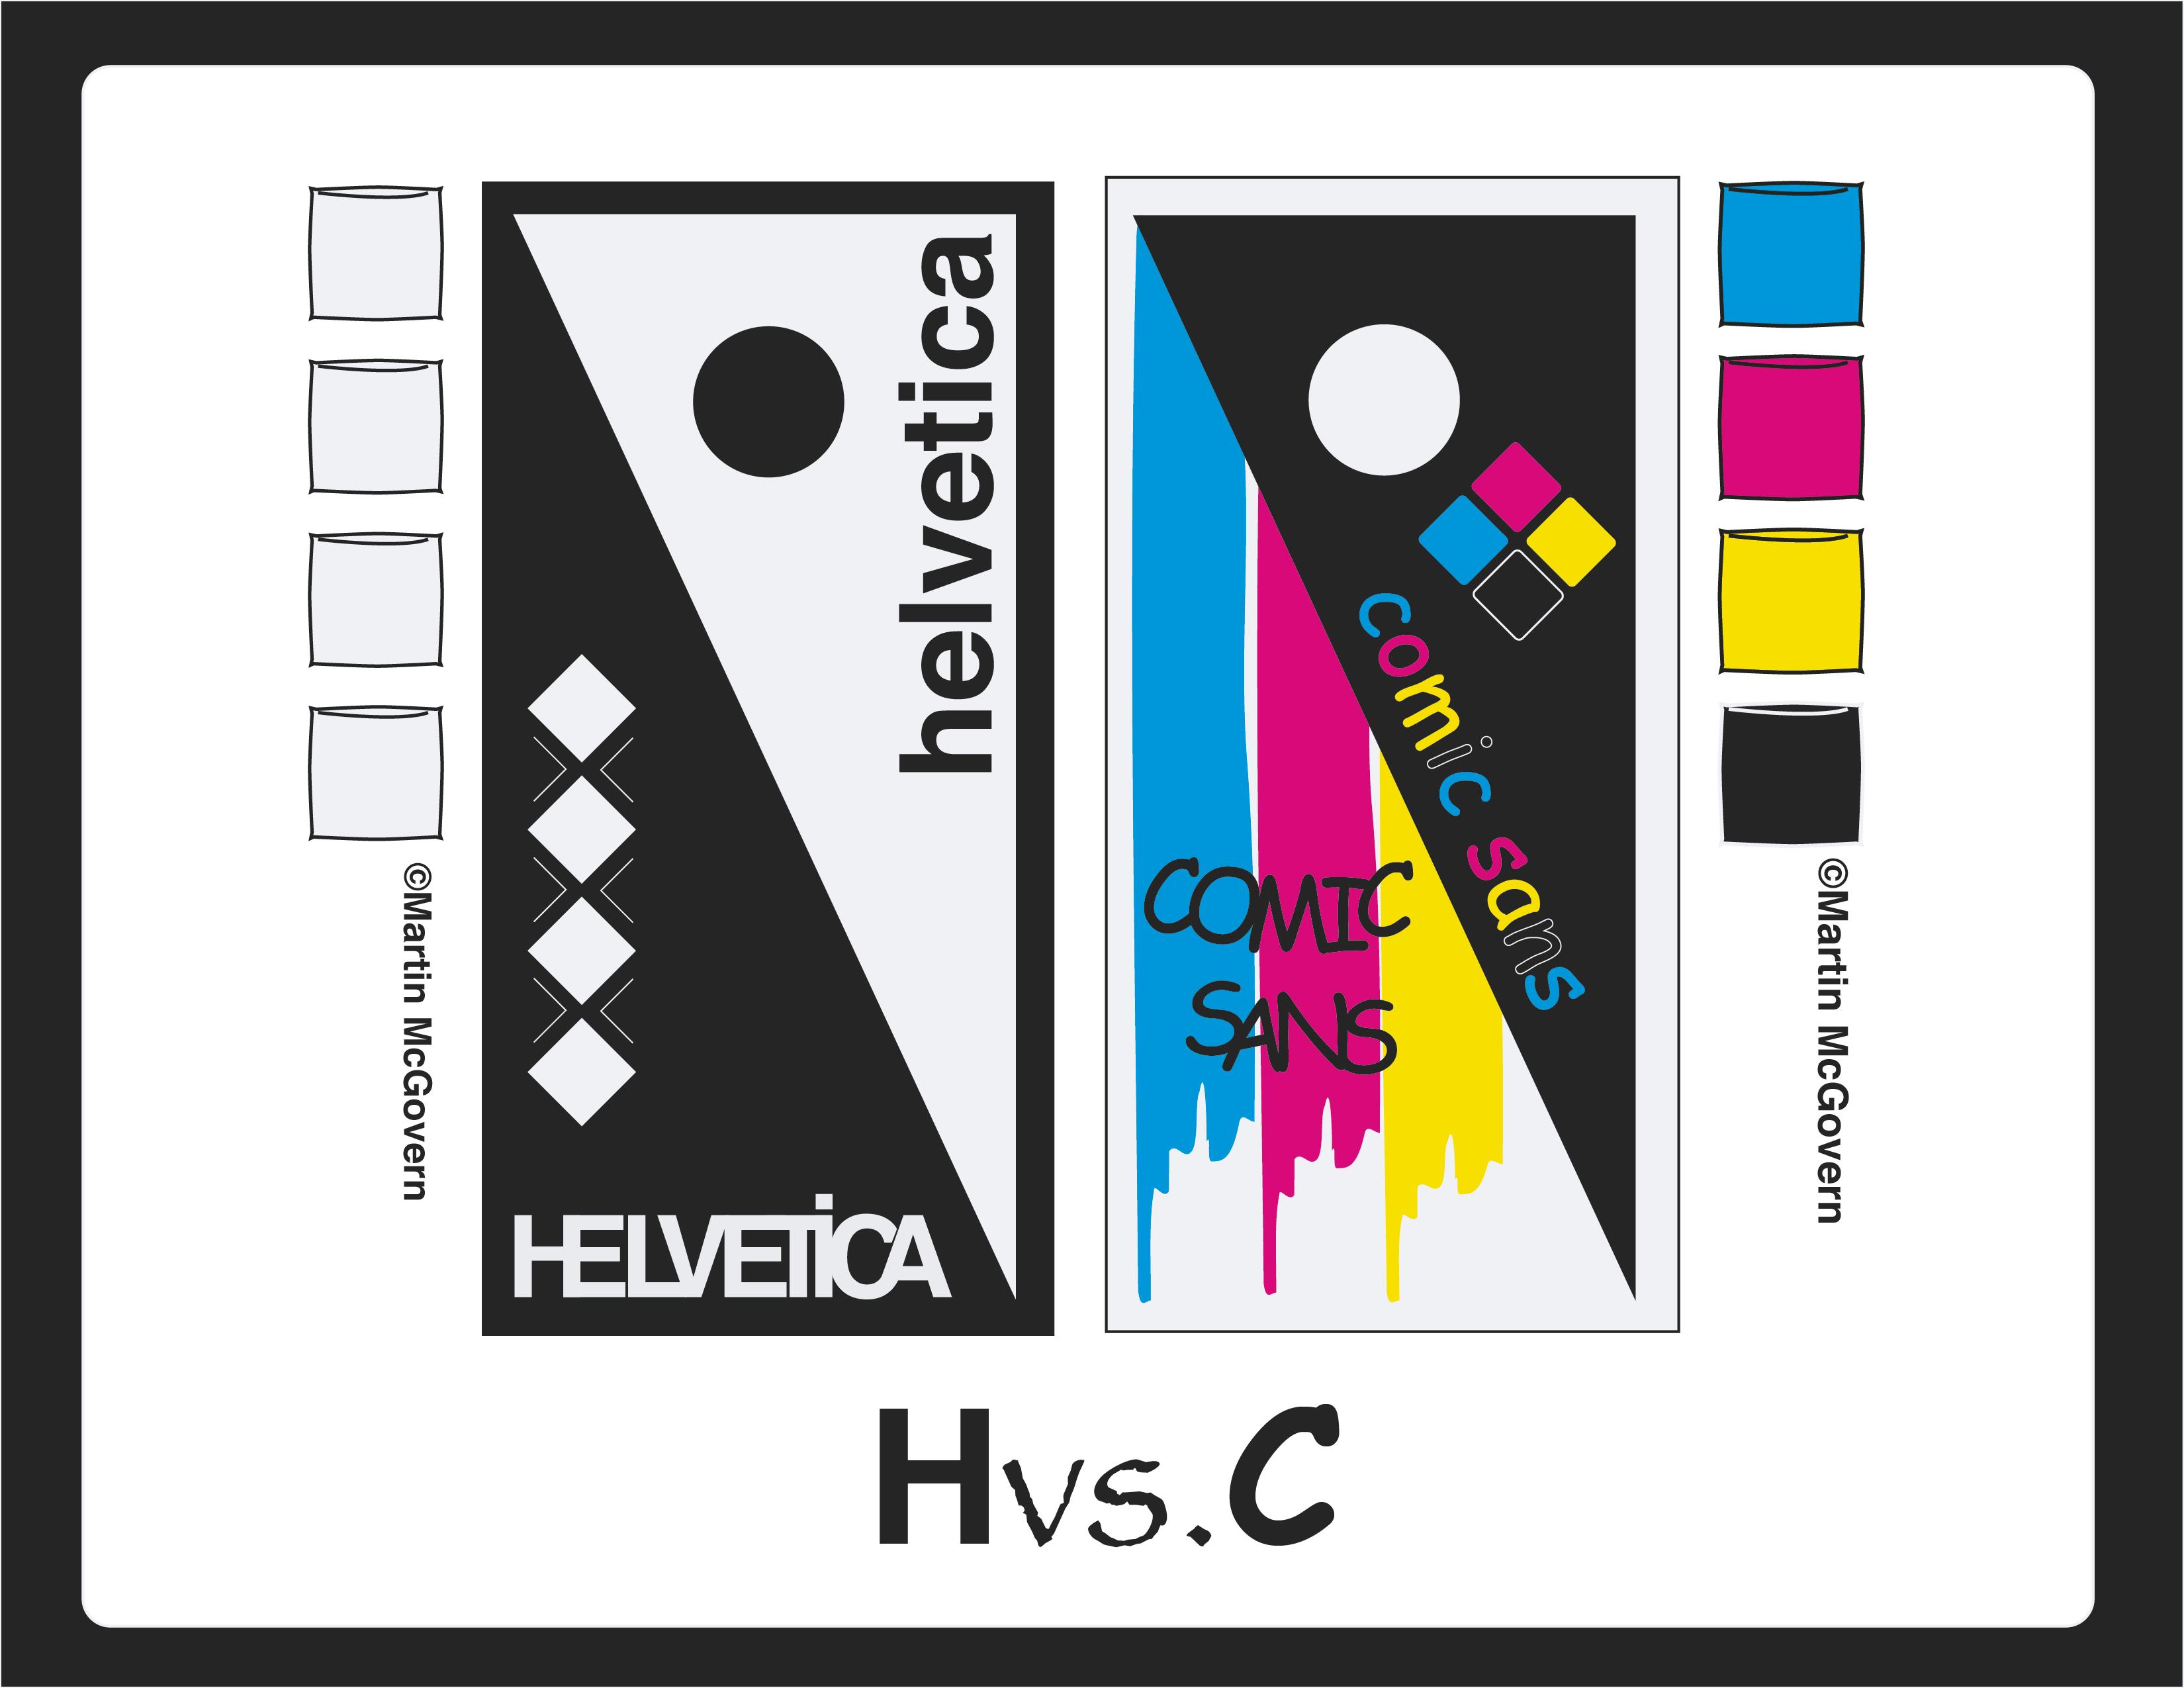 Helvetica vs. Comic Sans